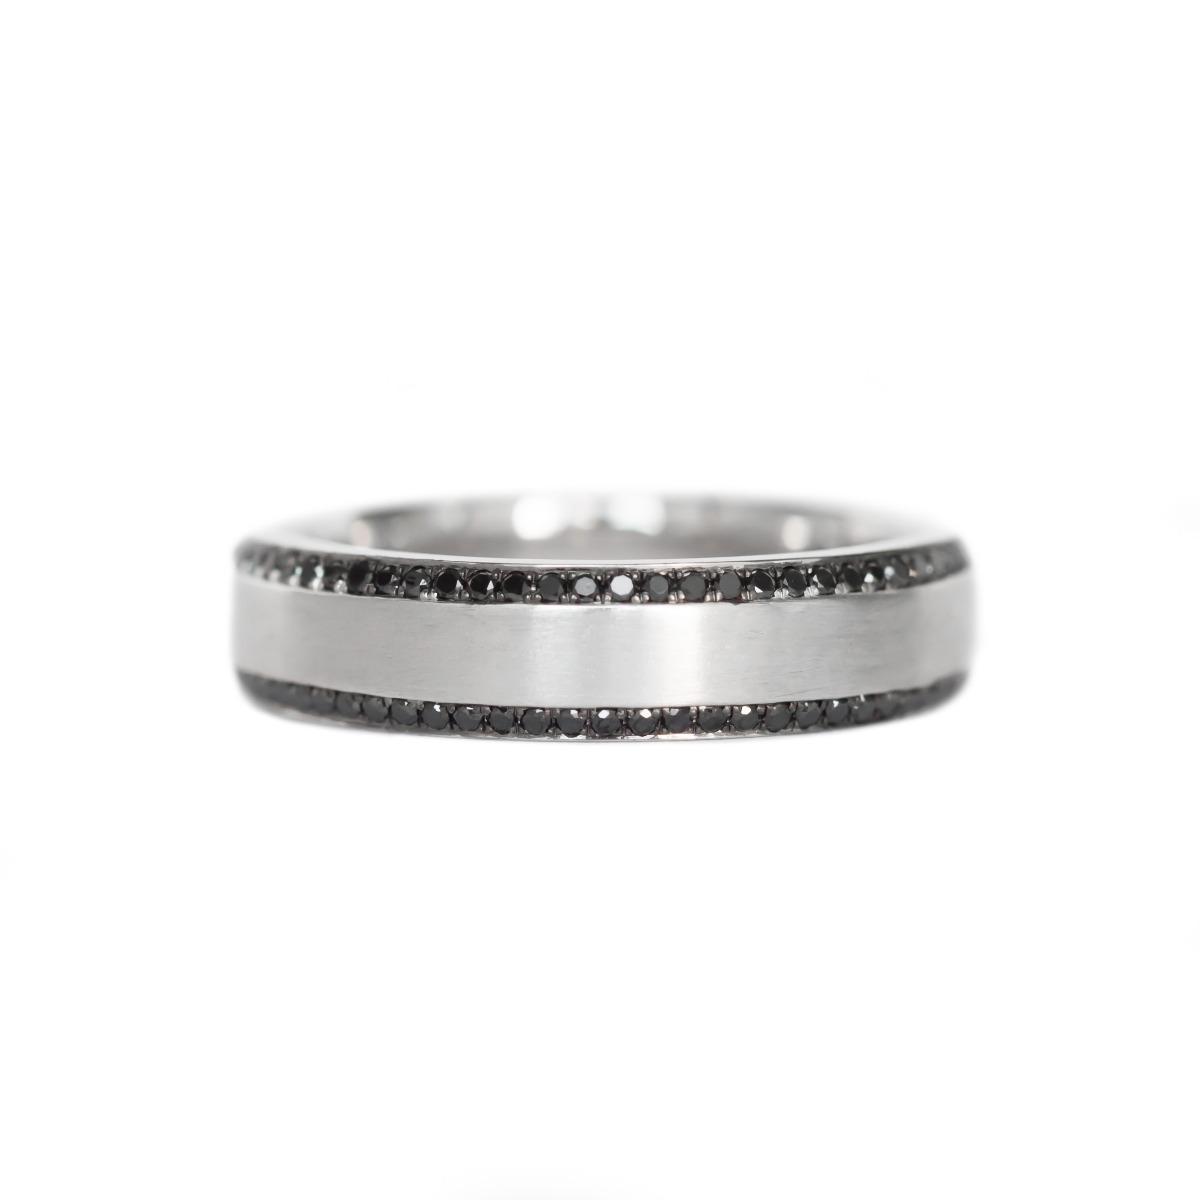 Men's Beveled Edge Wedding Band With Black Diamonds Along Edges in White Gold (5mm)